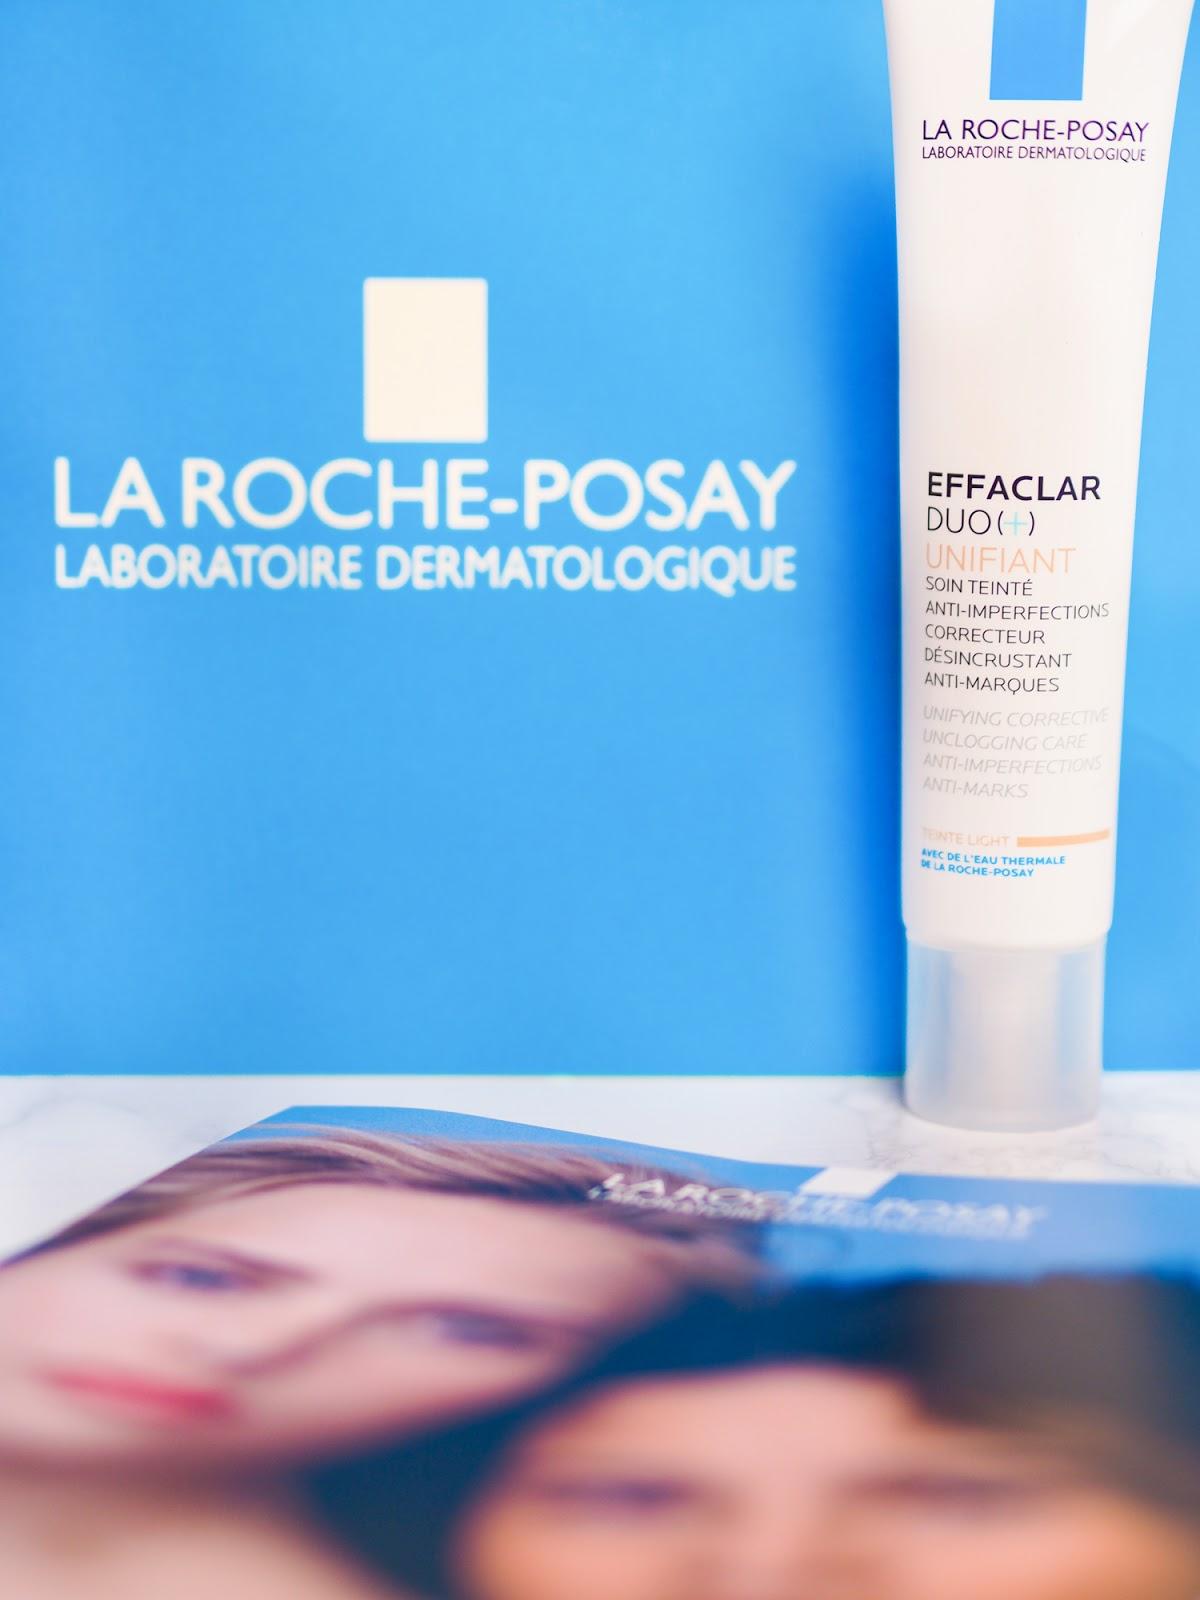 La Roche Posay Effeclar Duo(+) Unifiant Review